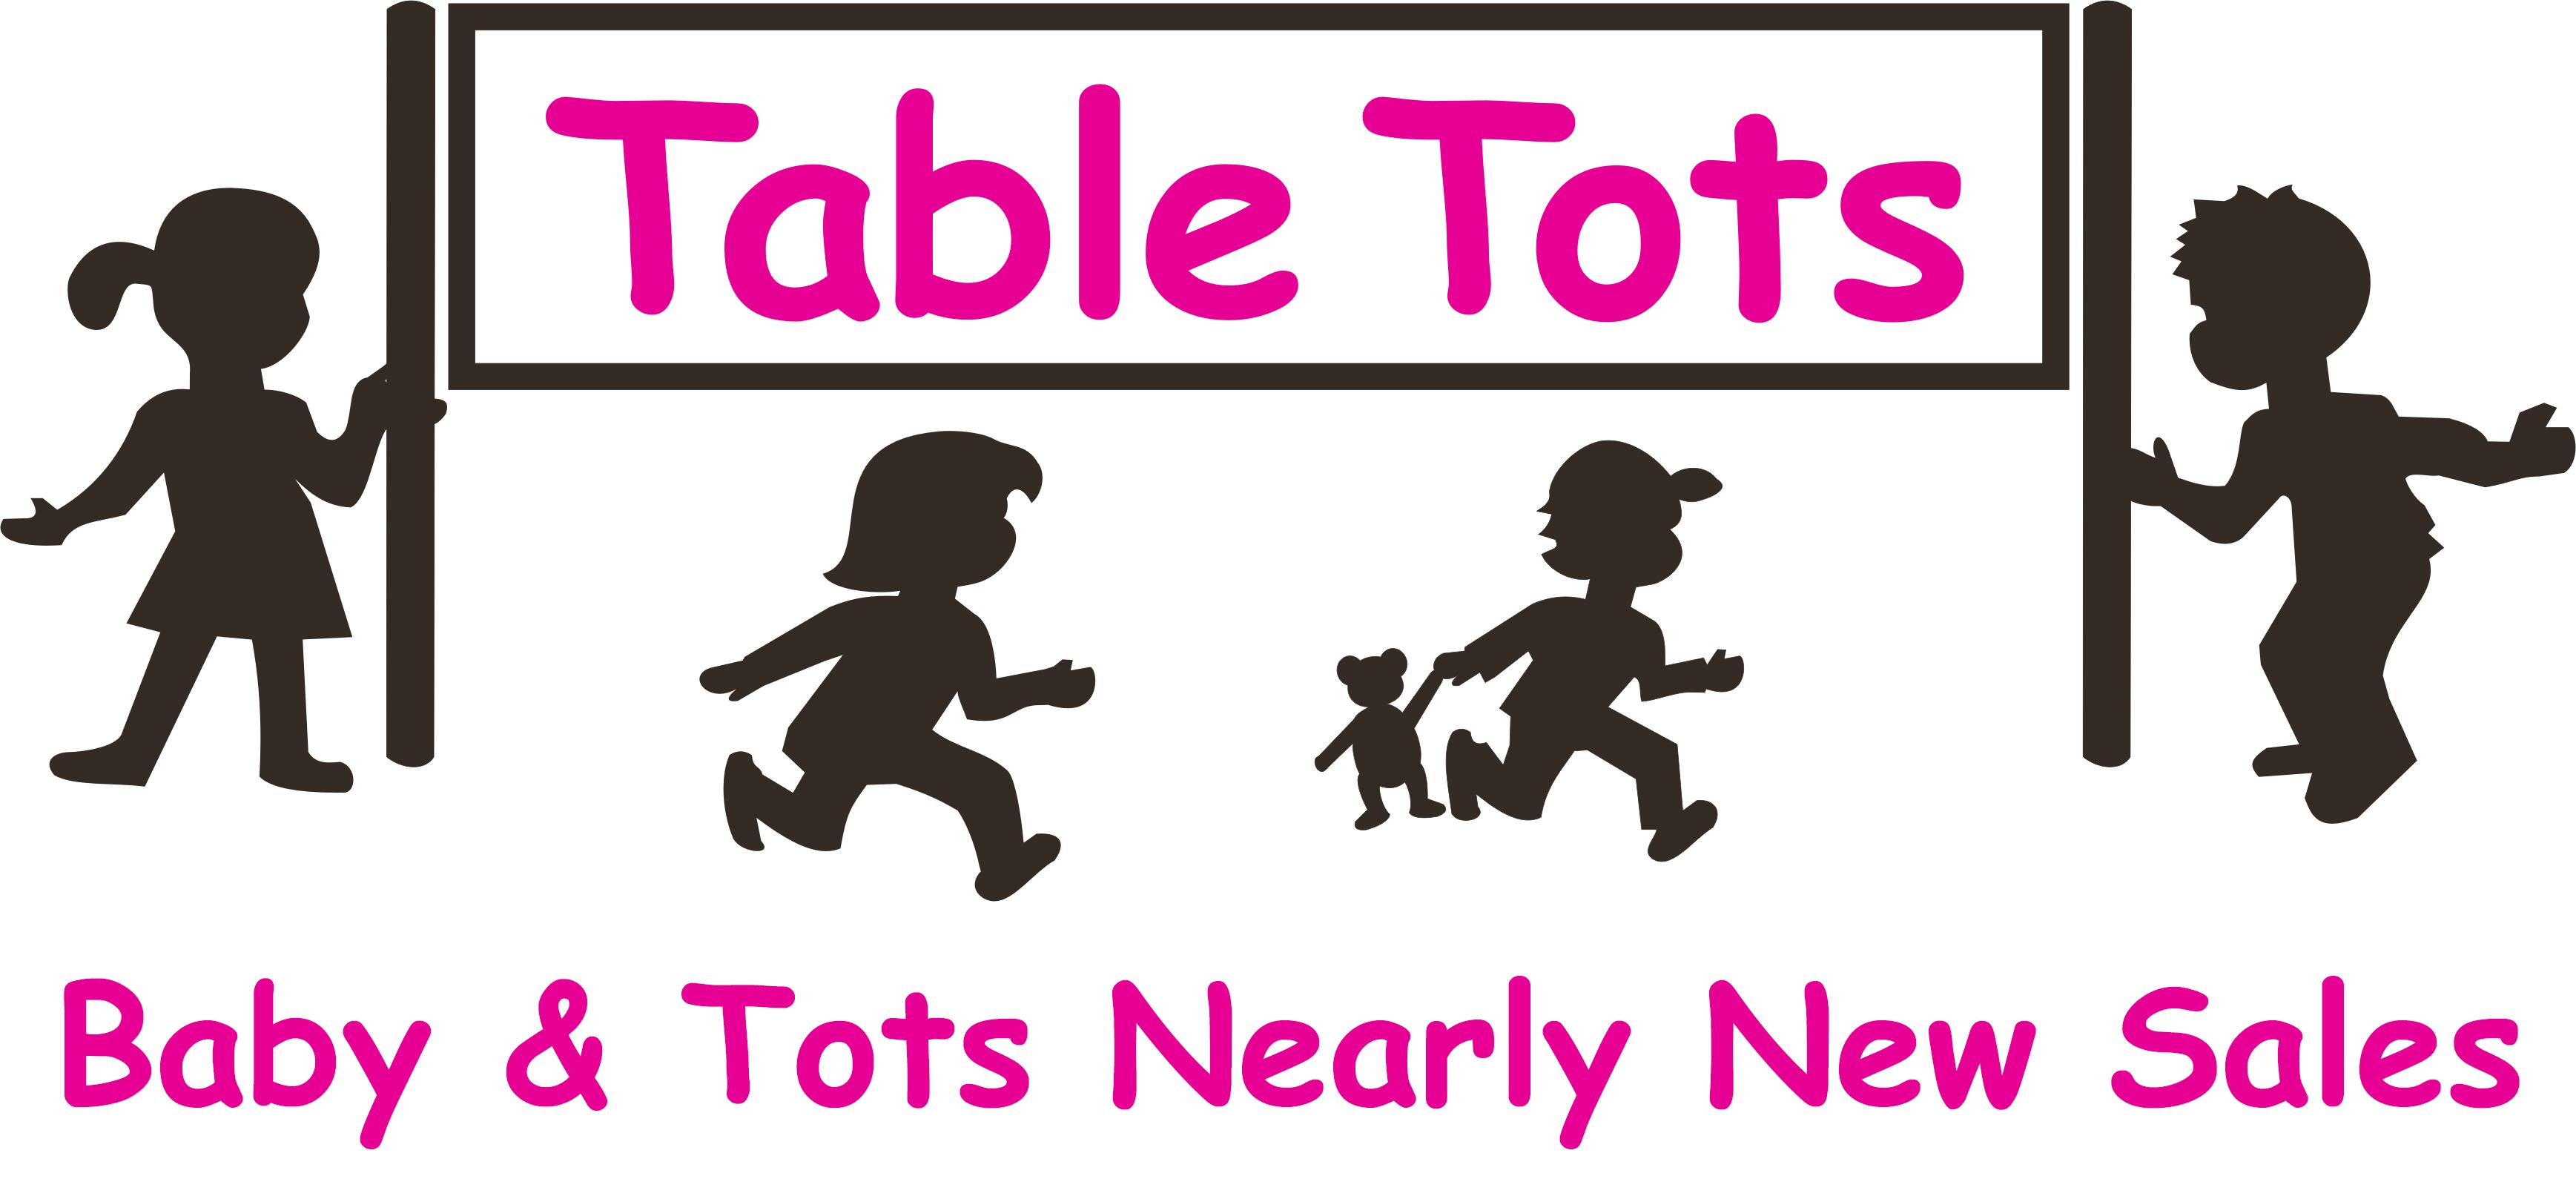 db5e08f0e Products - Table Tots